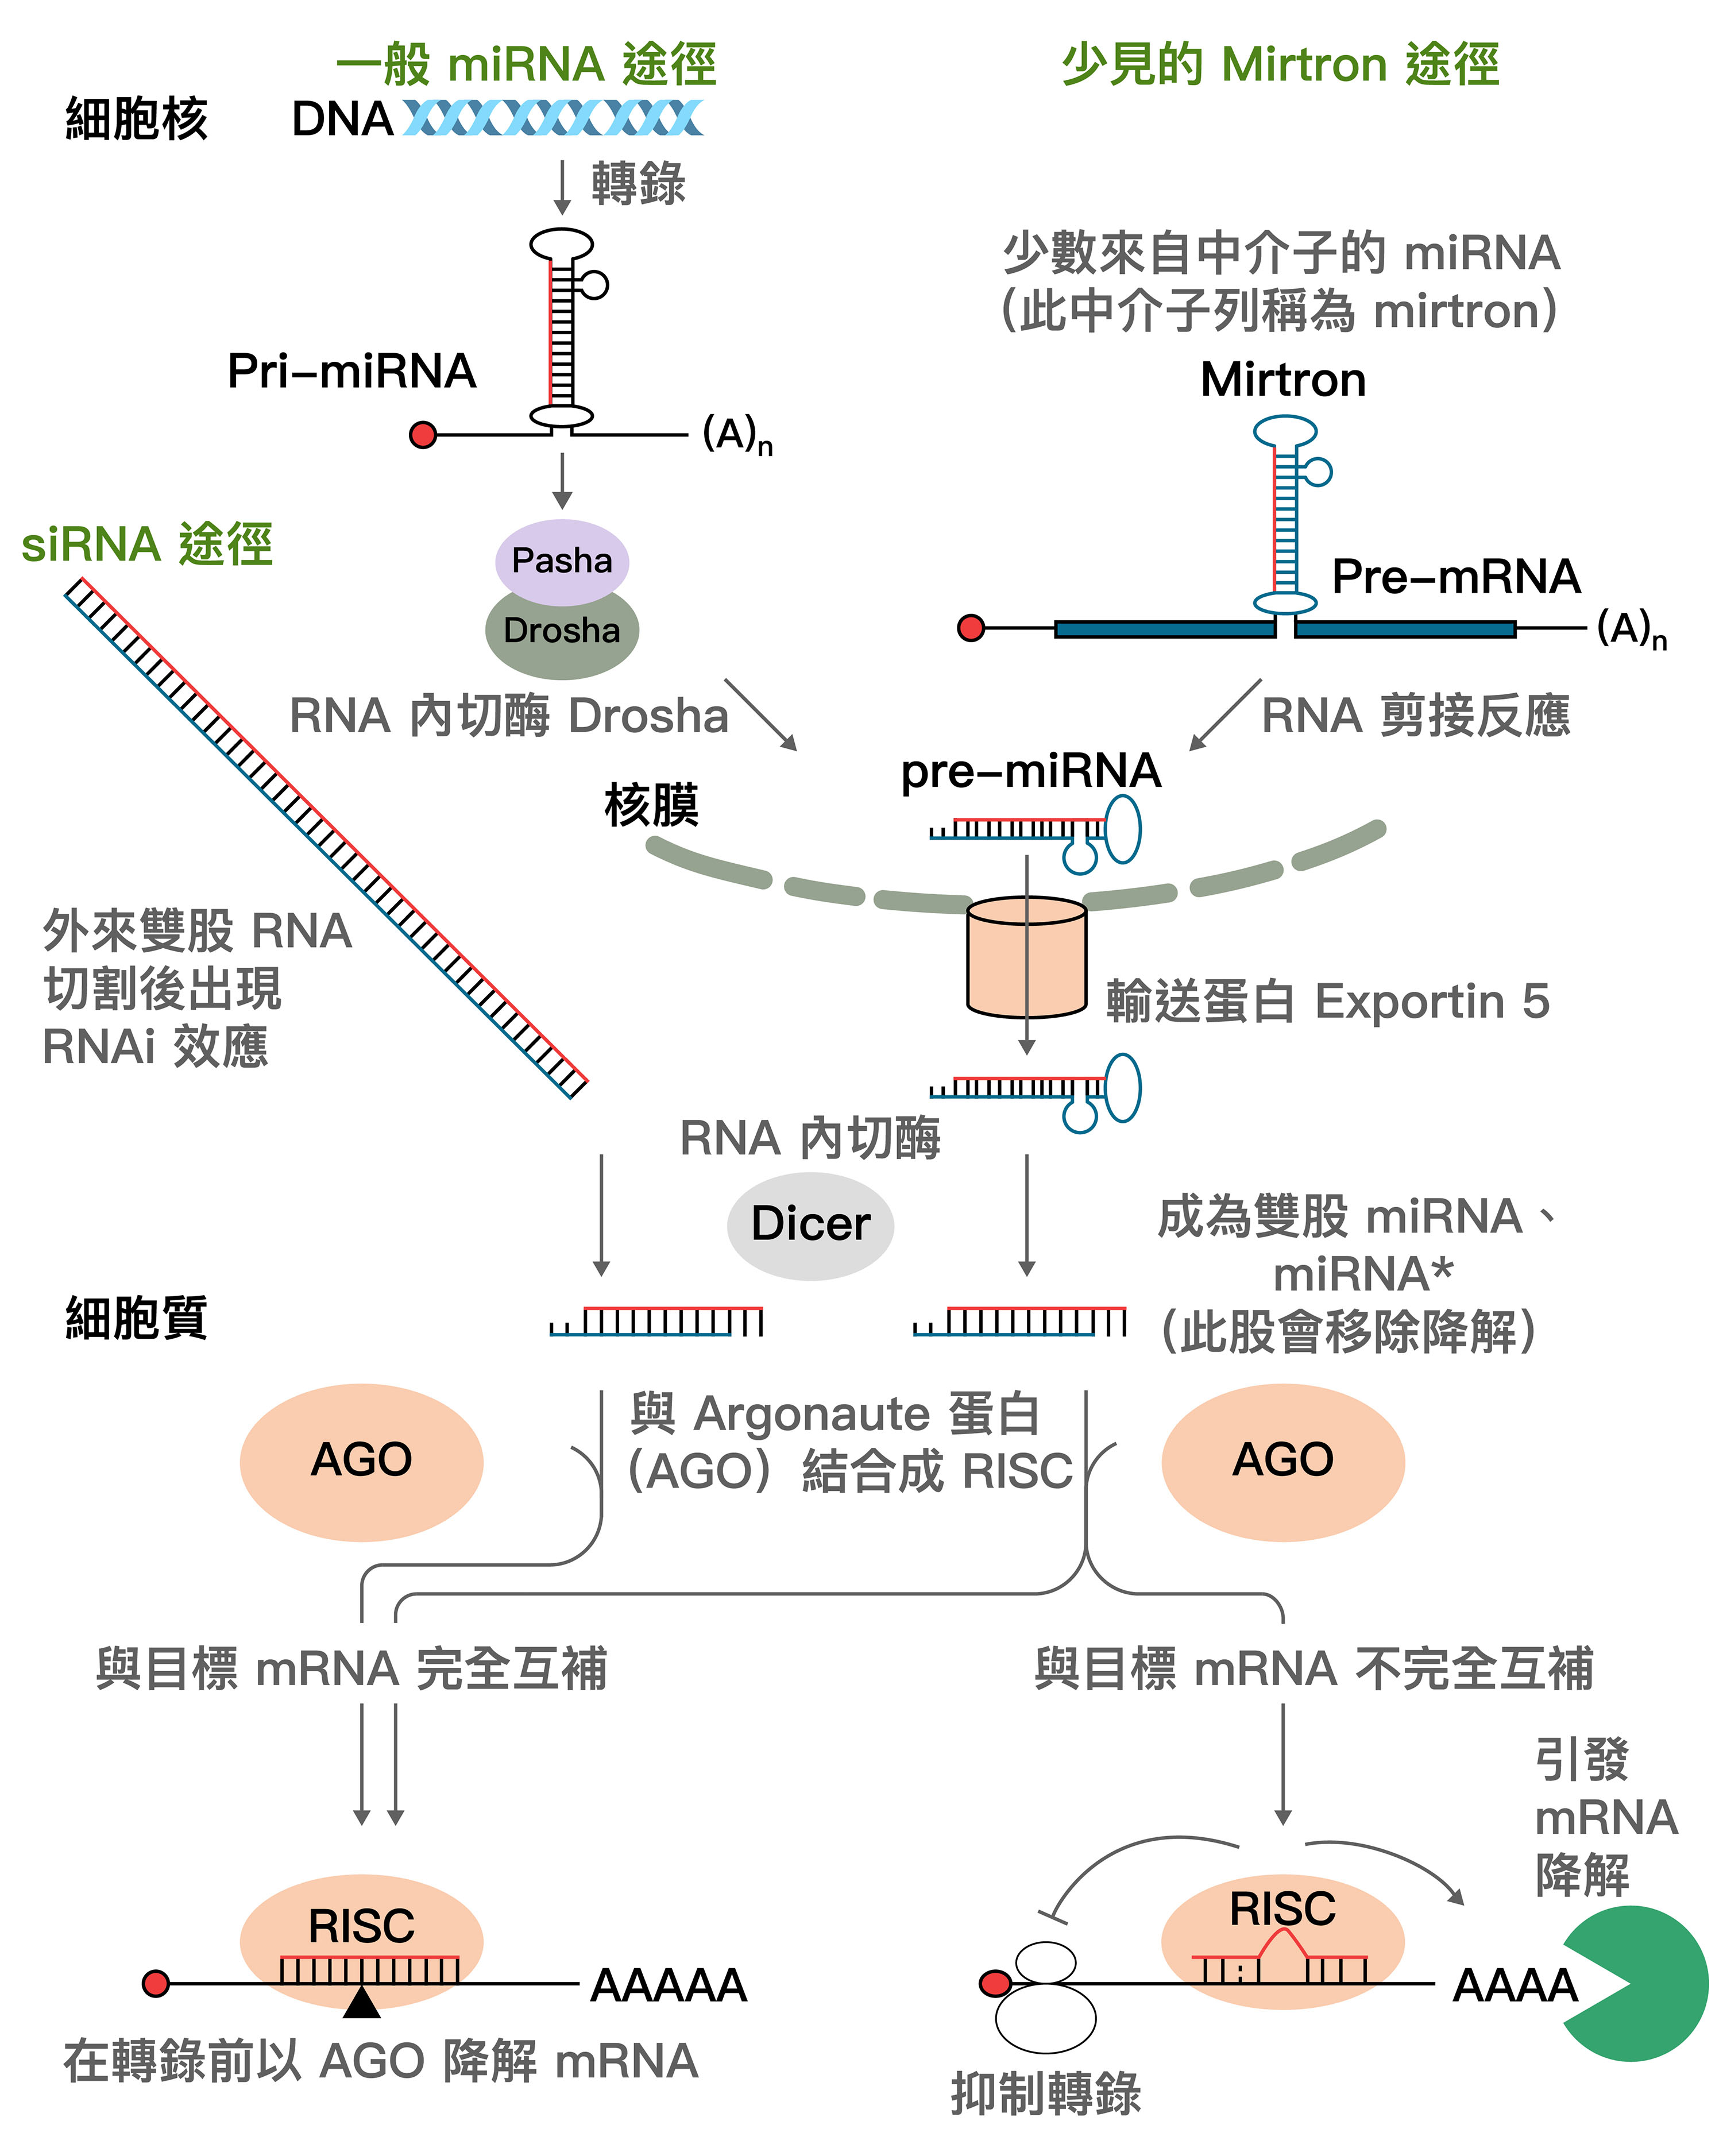 【miRNA 和 siRNA 的生成與作用】一般路徑 (圖片由上至下):1. DNA 與 RNA 聚合酶轉錄出上百至上千核苷酸長的 Pri-miRNA,透過 Drosha 切割為 60~70 核苷酸長的 pre-miRNA。2. pre-miRNA 經過輸送蛋白 Exportin-5 進入細胞質,由 Dicer 切割為約 22 核苷酸長度的 miRNA 和互補股 miRNA* (將被移除降解的一股)。3. miRNA 和 AGO 蛋白結合成 RISC ,尋找並結合目標 mRNA。完美結合就可以迅速切斷、降解 mRNA。結合不完全,形成突起 (bulge) 的話,就會抑制核糖體轉錄功能,進而由來自 RISC 的去腺嘧啶酶 (deadenylase) 複合物降解 mRNA。----較少見的 Mirtron 路徑 (圖片右上至右下):1. 來自中介子 (intron) 的 miRNA 序列,不經過 Drosha,而是由 RNA 剪接反應形成 pre-miRNA。此後的步驟與一般路徑相同。----siRNA 路徑 (圖片左側至左下):1. 外來雙股 DNA 進入細胞質,由 Dicer 切割為數十核苷酸長度的雙股 RNA。2. 其中一股與 AGO 等蛋白組成 RISC,可以和目標 mRNA 完美結合,並將其切斷降解。圖│研之有物 (資料來源│詹世鵬,2010。〈小兵立大功─ 微小核醣核酸與小干擾核醣核酸〉,《化學》,68 (4),303 – 312。)